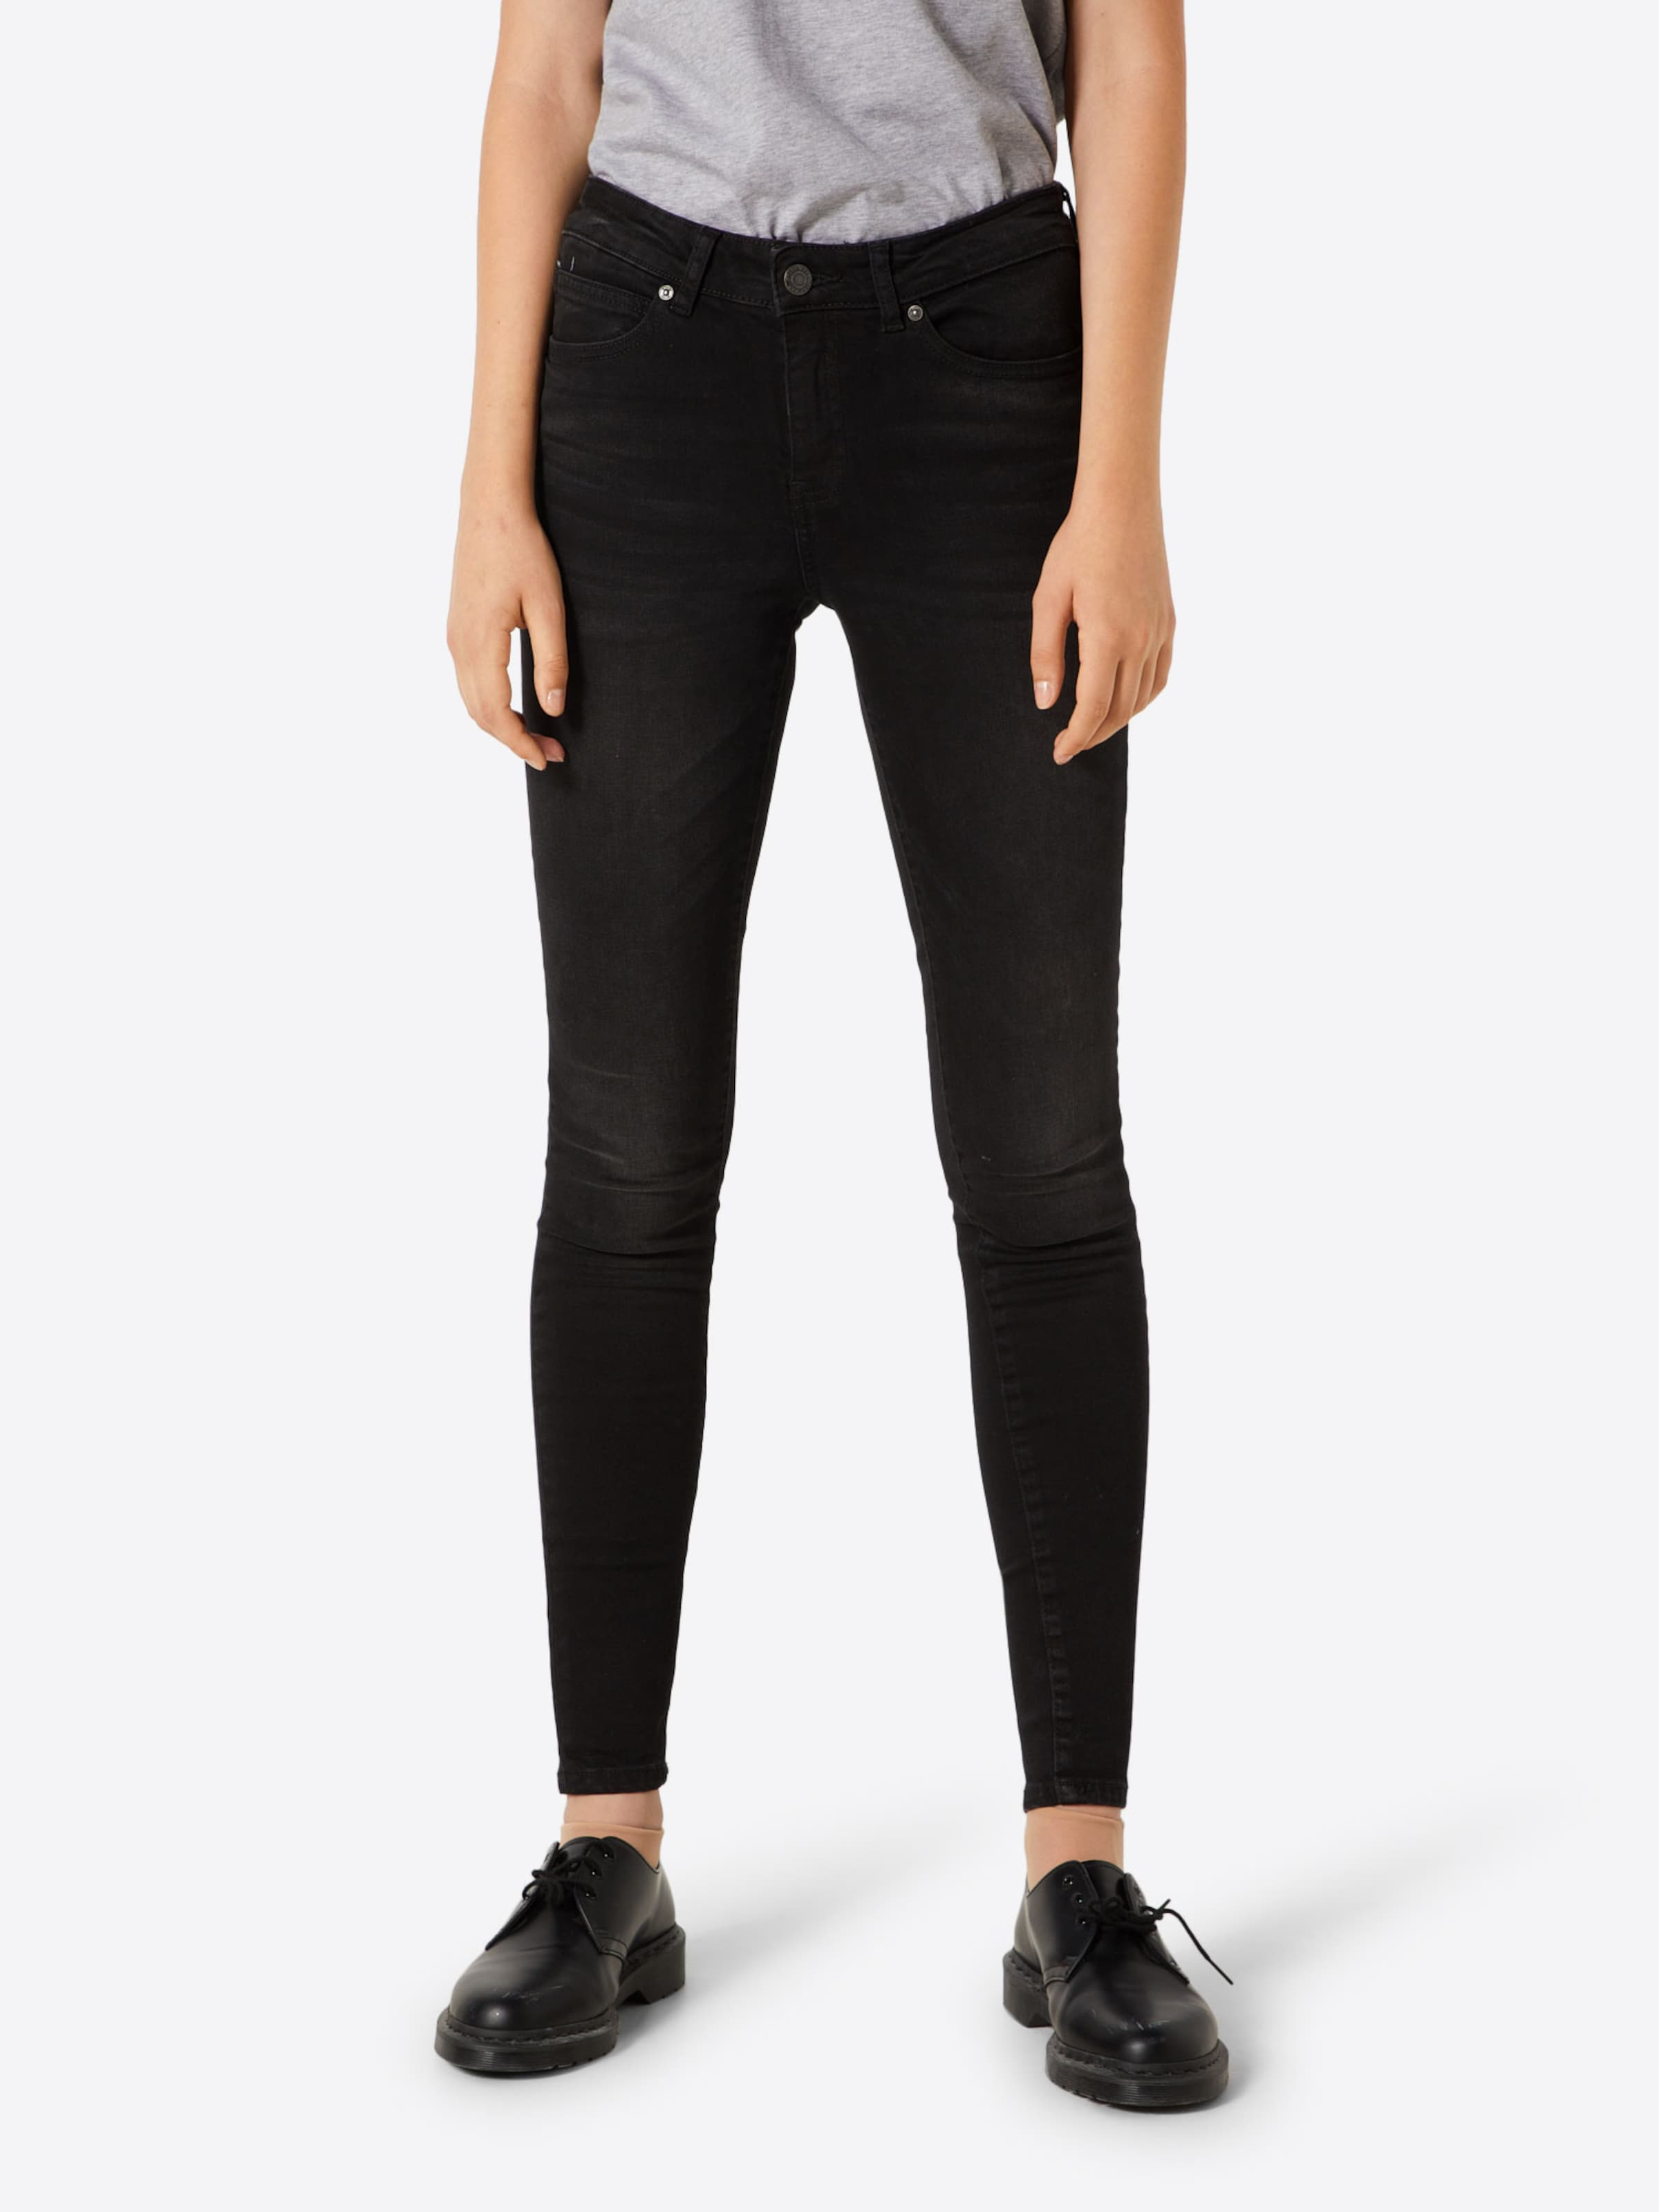 Black Denim Jeans May In Noisy 5A4RLj